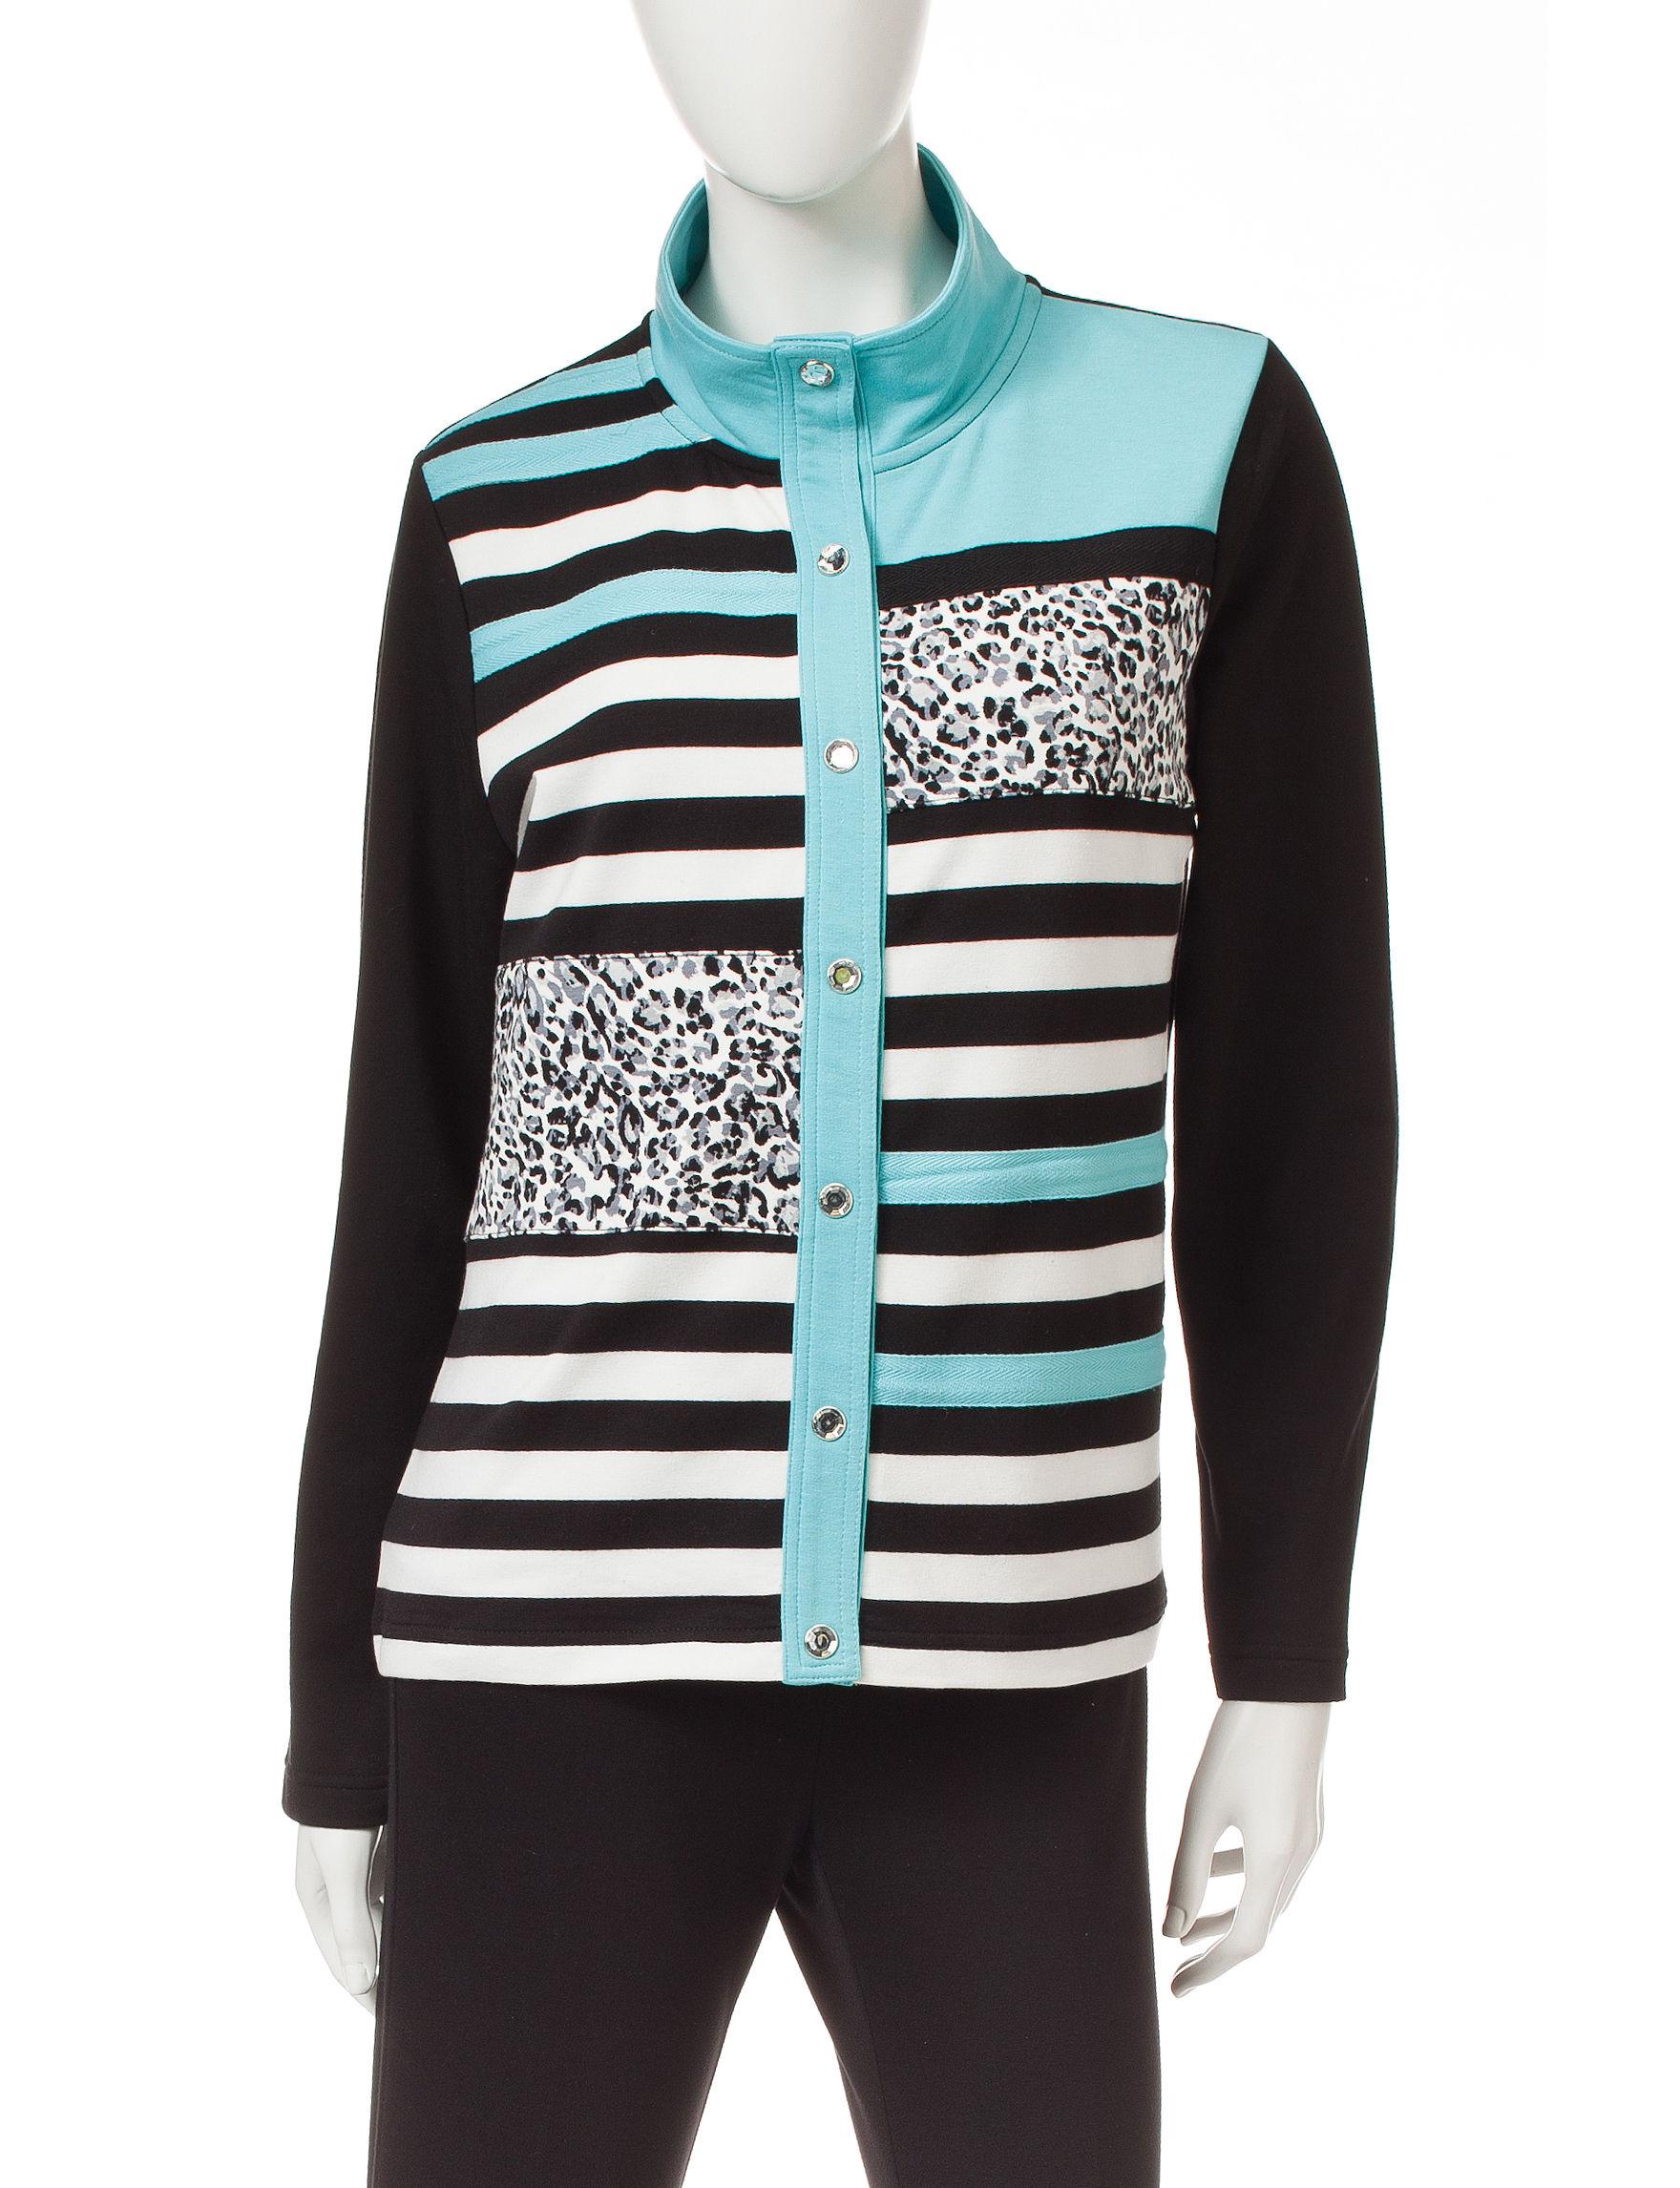 Onque Casuals Black Lightweight Jackets & Blazers